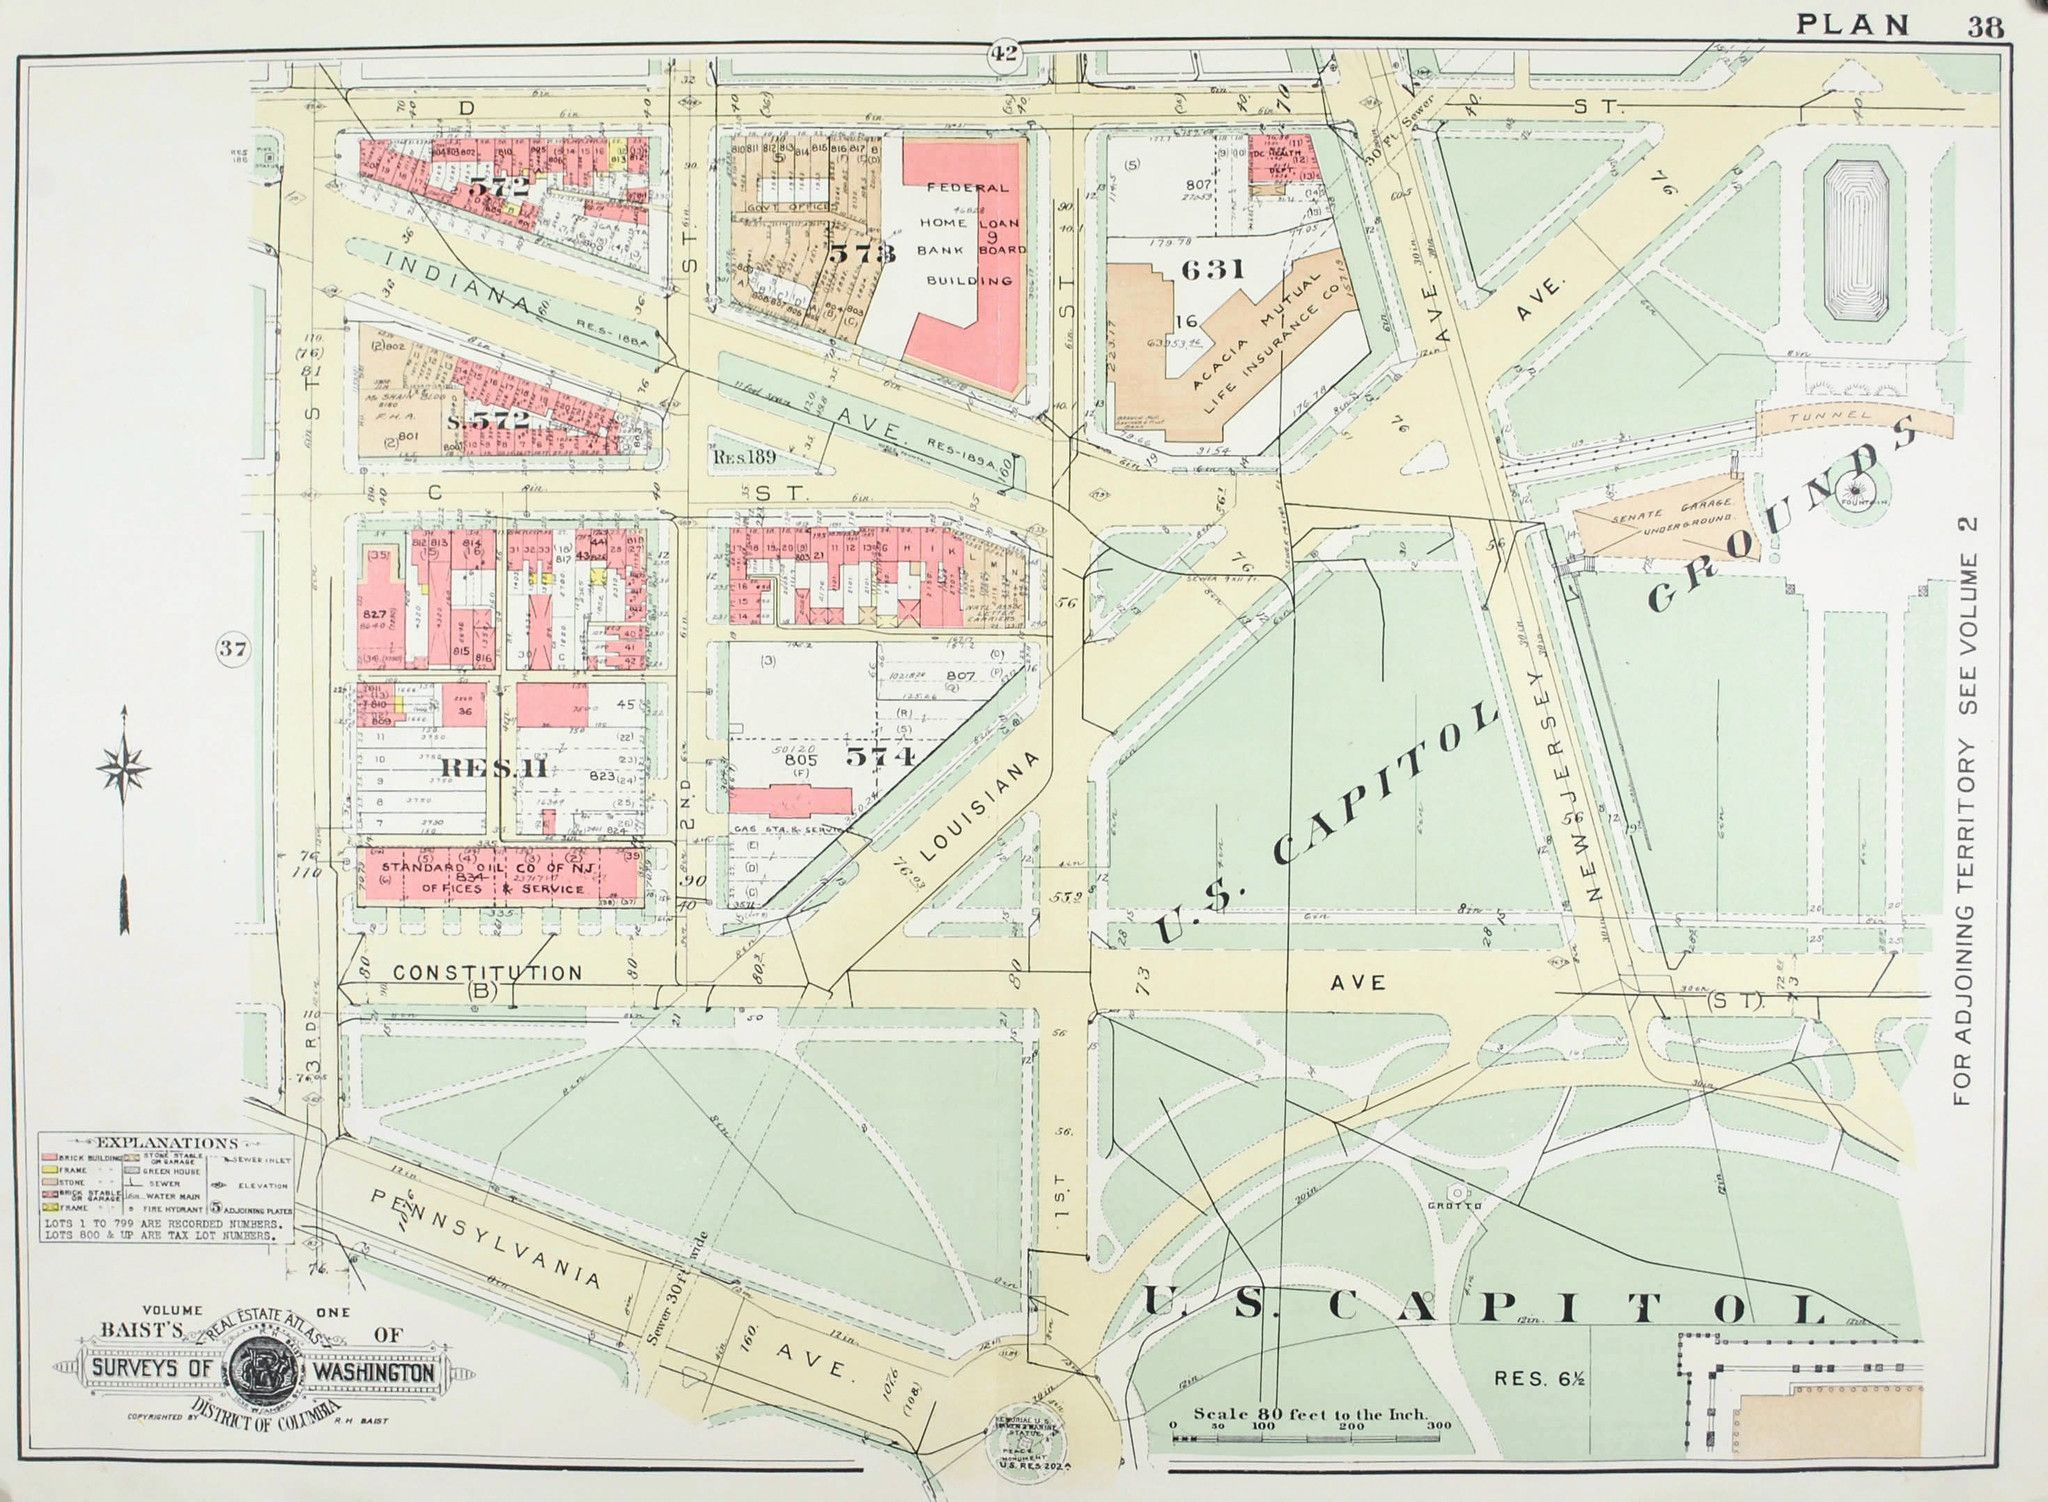 Washington DC US Capitol Grounds Vintage Baist City Map - Map of us capital building